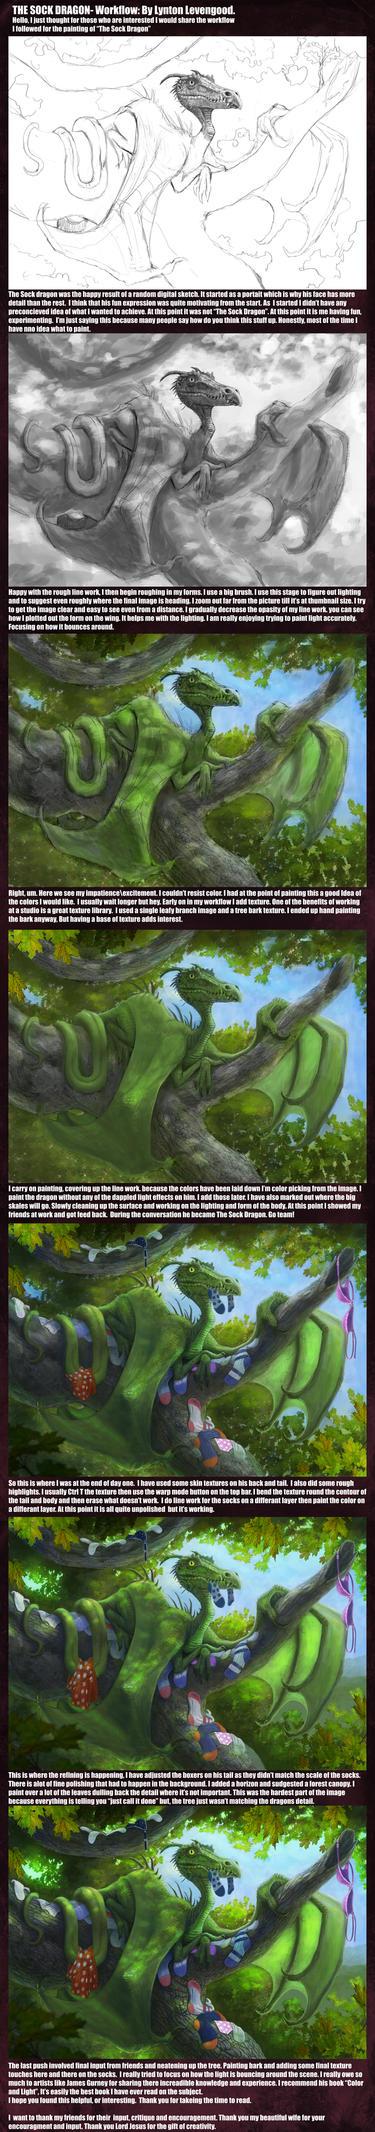 The Sock Dragon Work Flow by LyntonLevengood